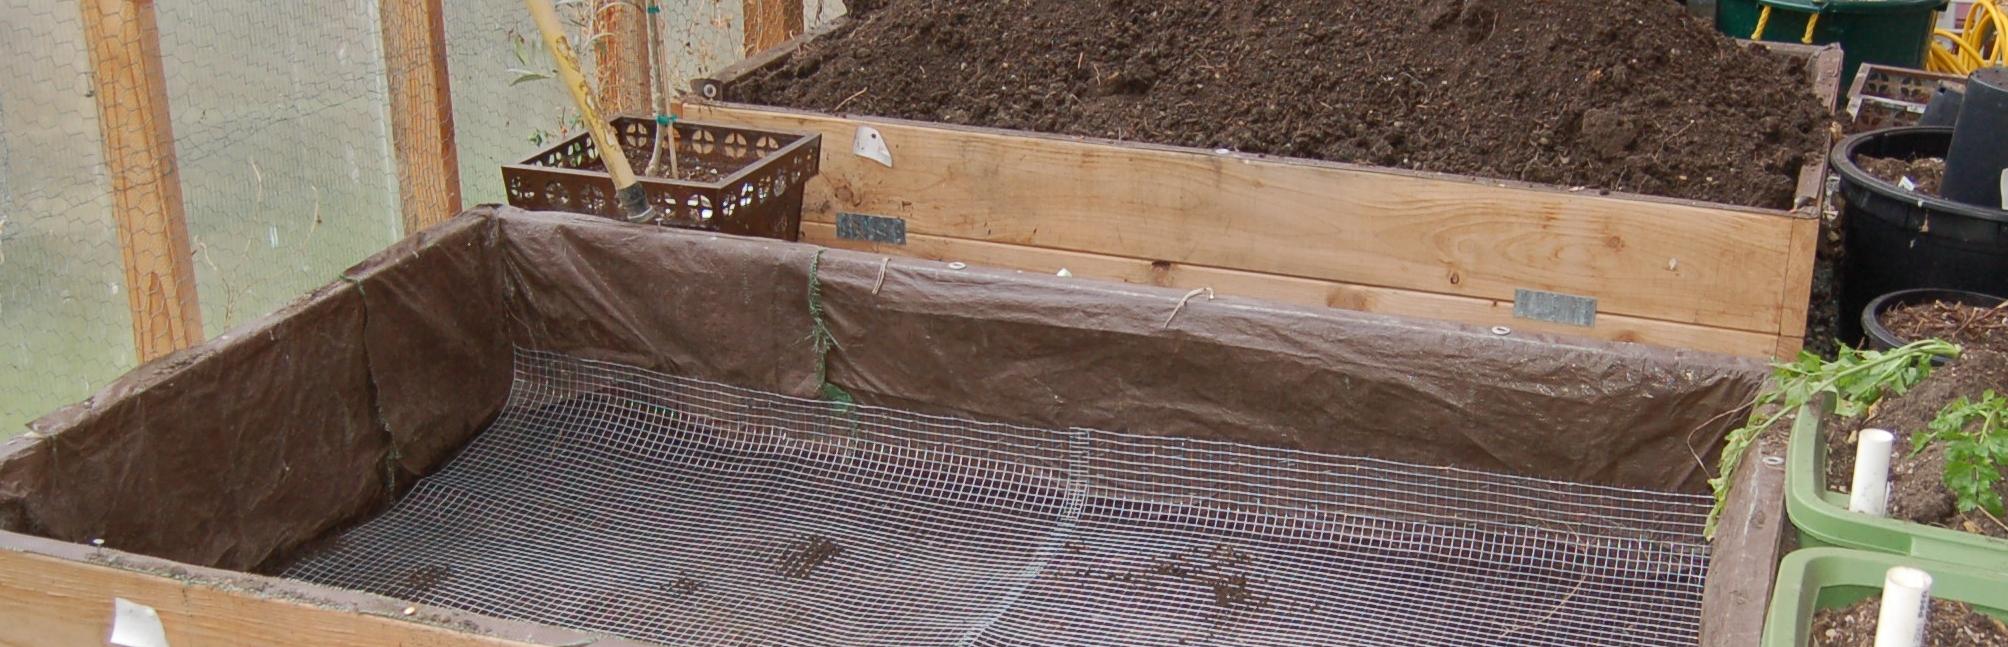 Mole Proof Raised Beds